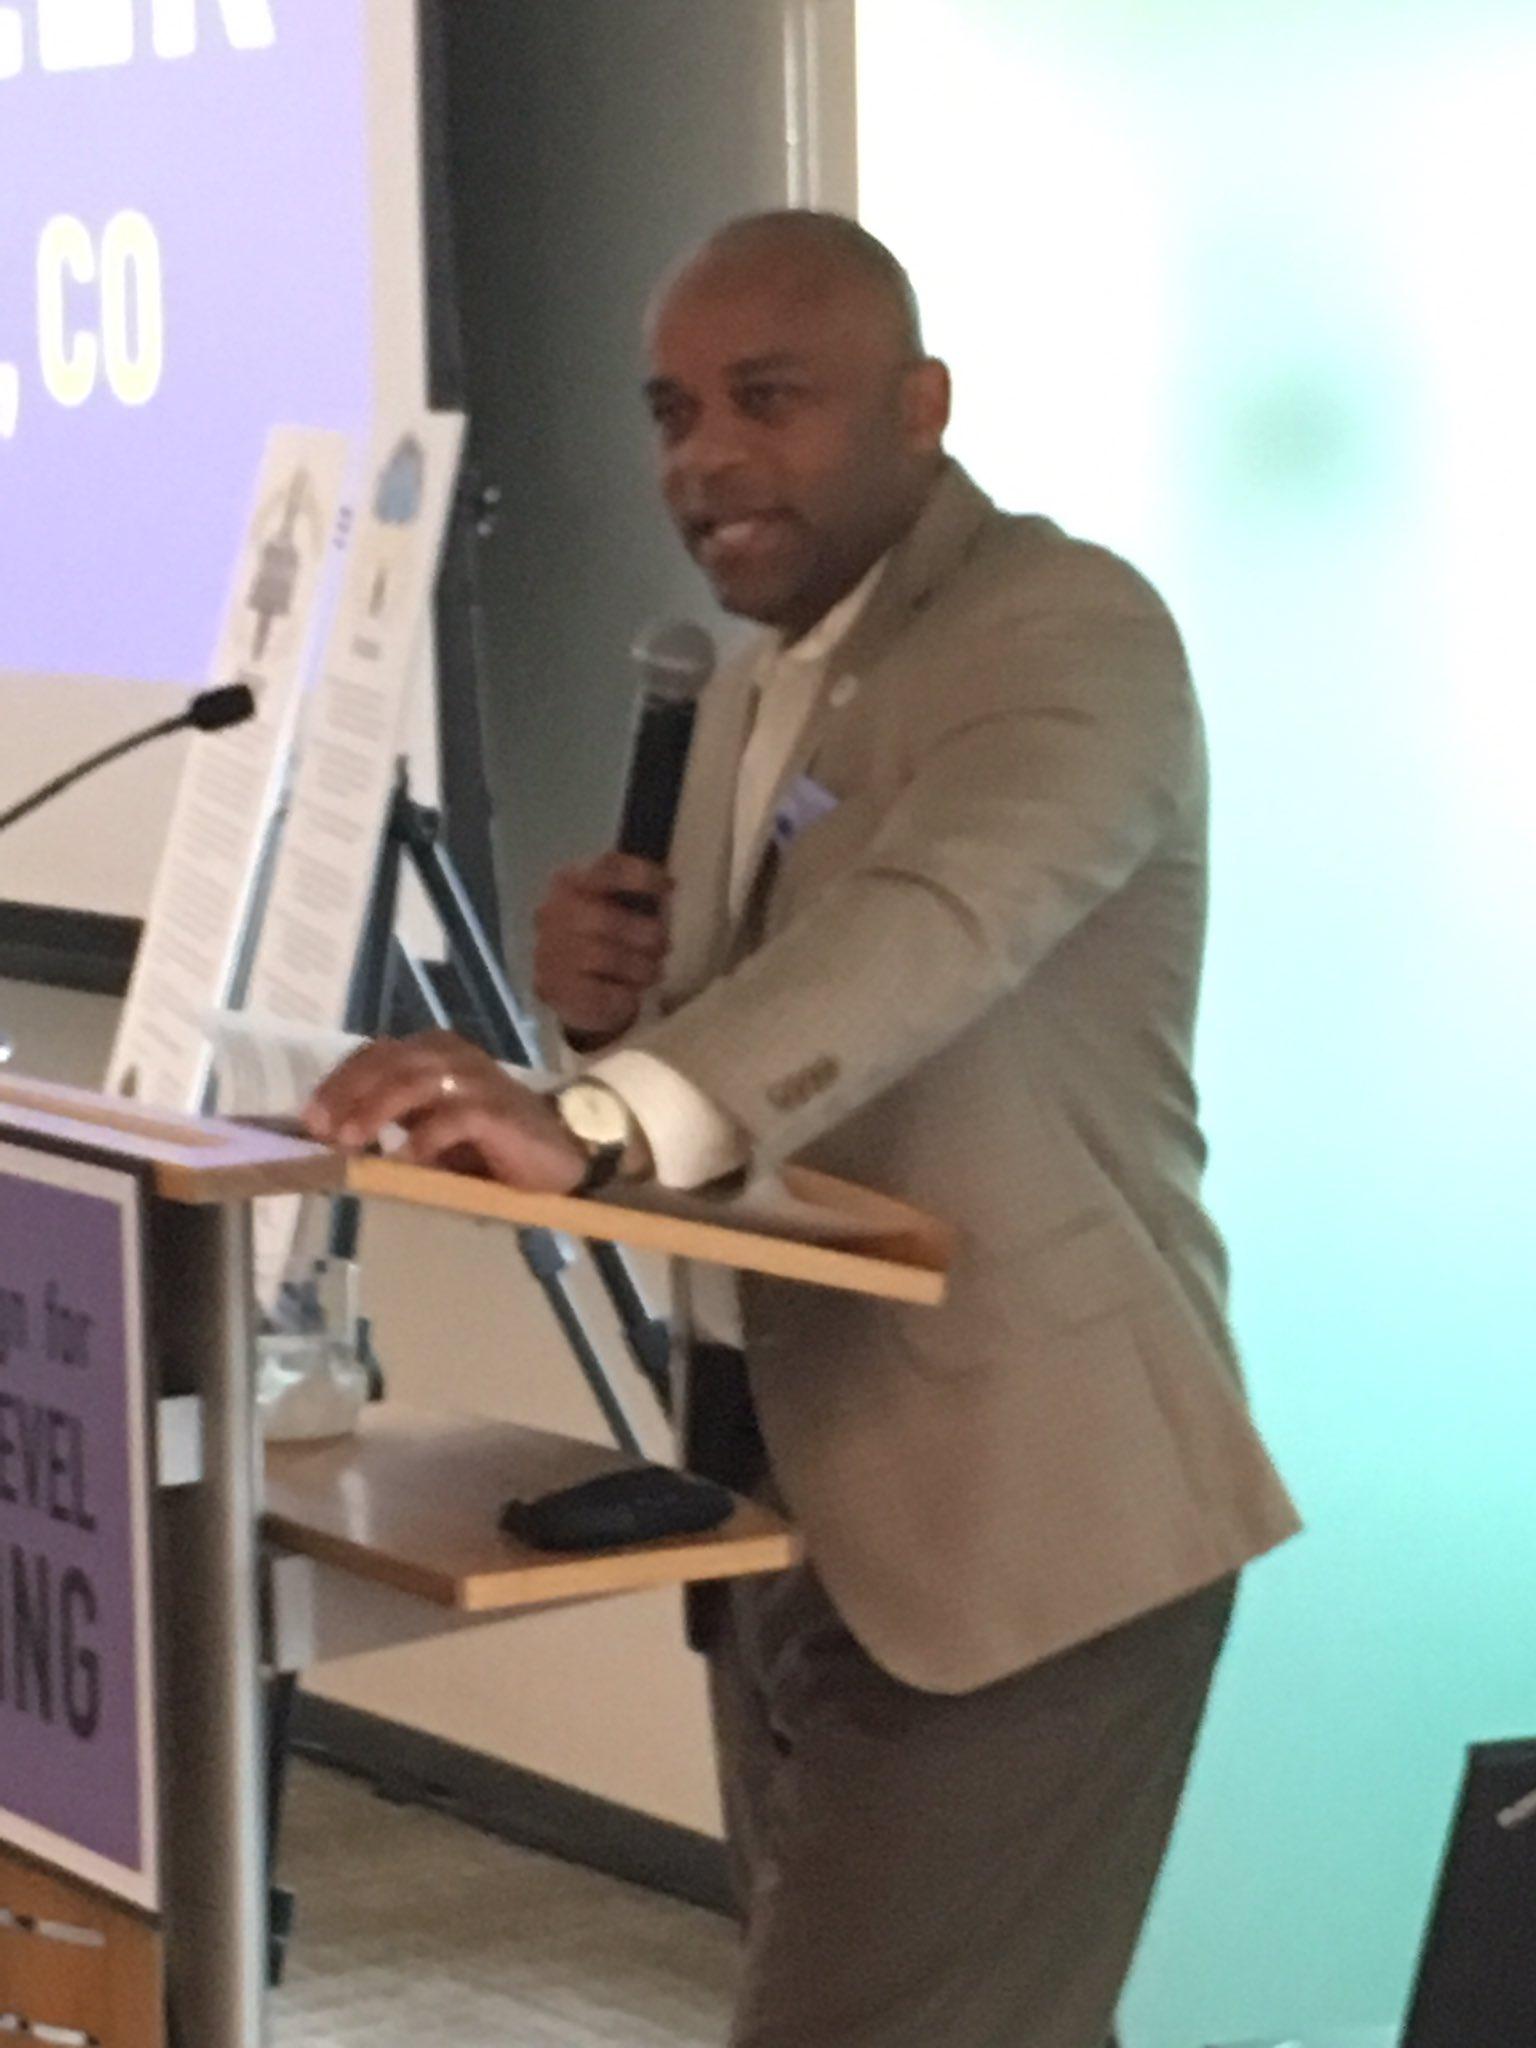 Denver's mayor, Michael Hancock welcomes GLR communities to Denver. #glrweek #glreading https://t.co/AVTWwTb68H